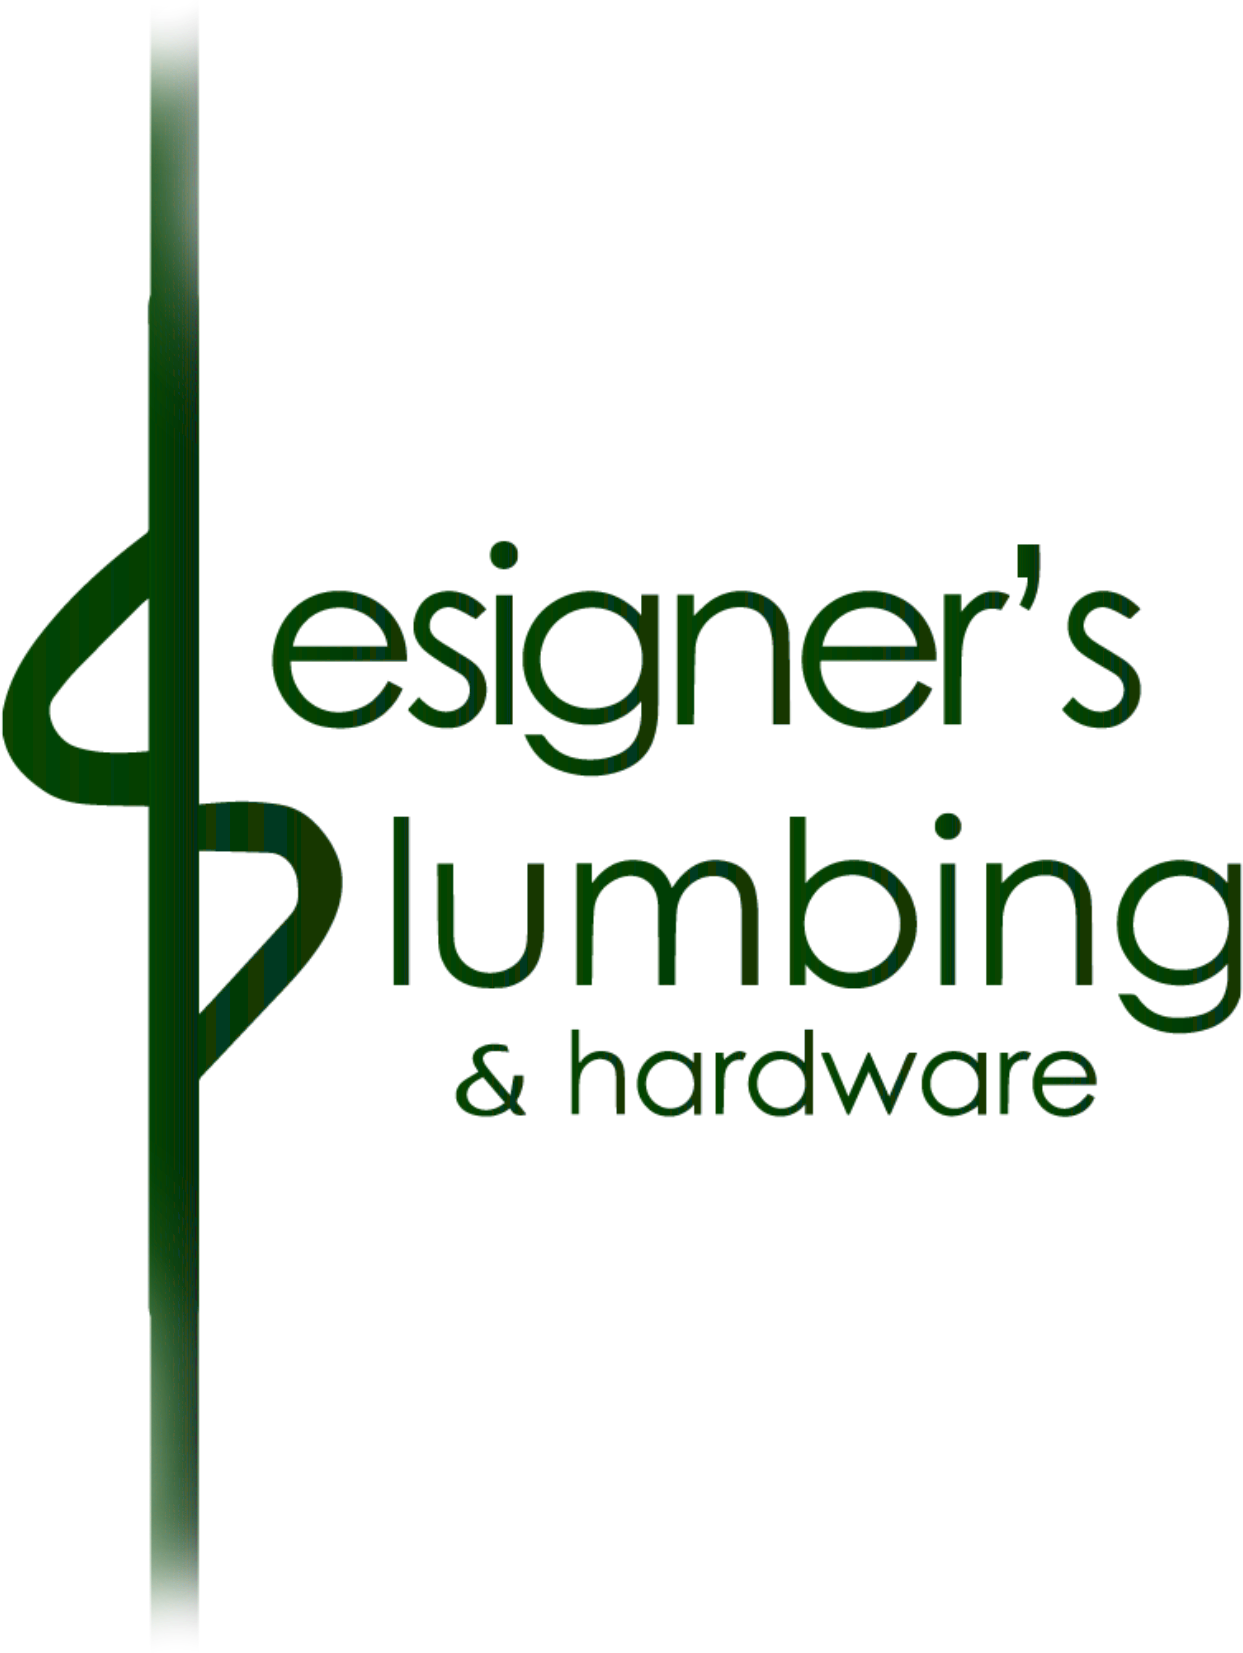 Designer's Plumbing